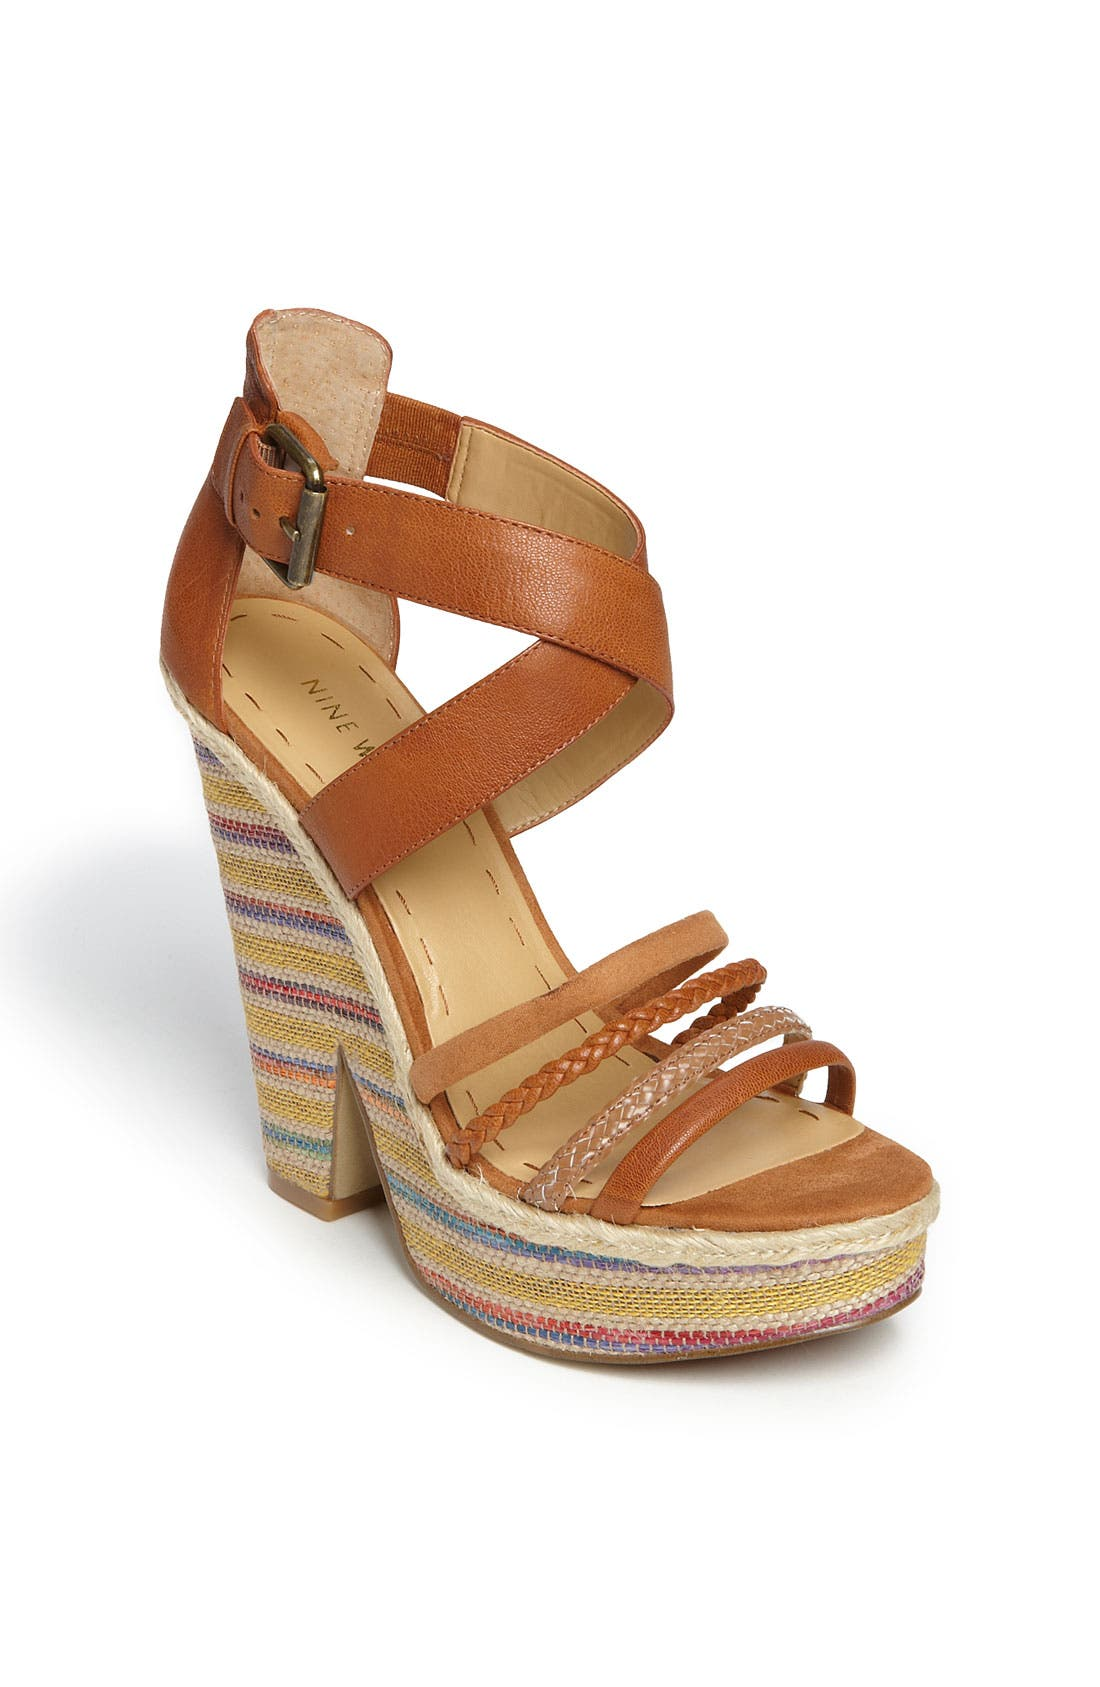 Alternate Image 1 Selected - Nine West 'Treston' Sandal